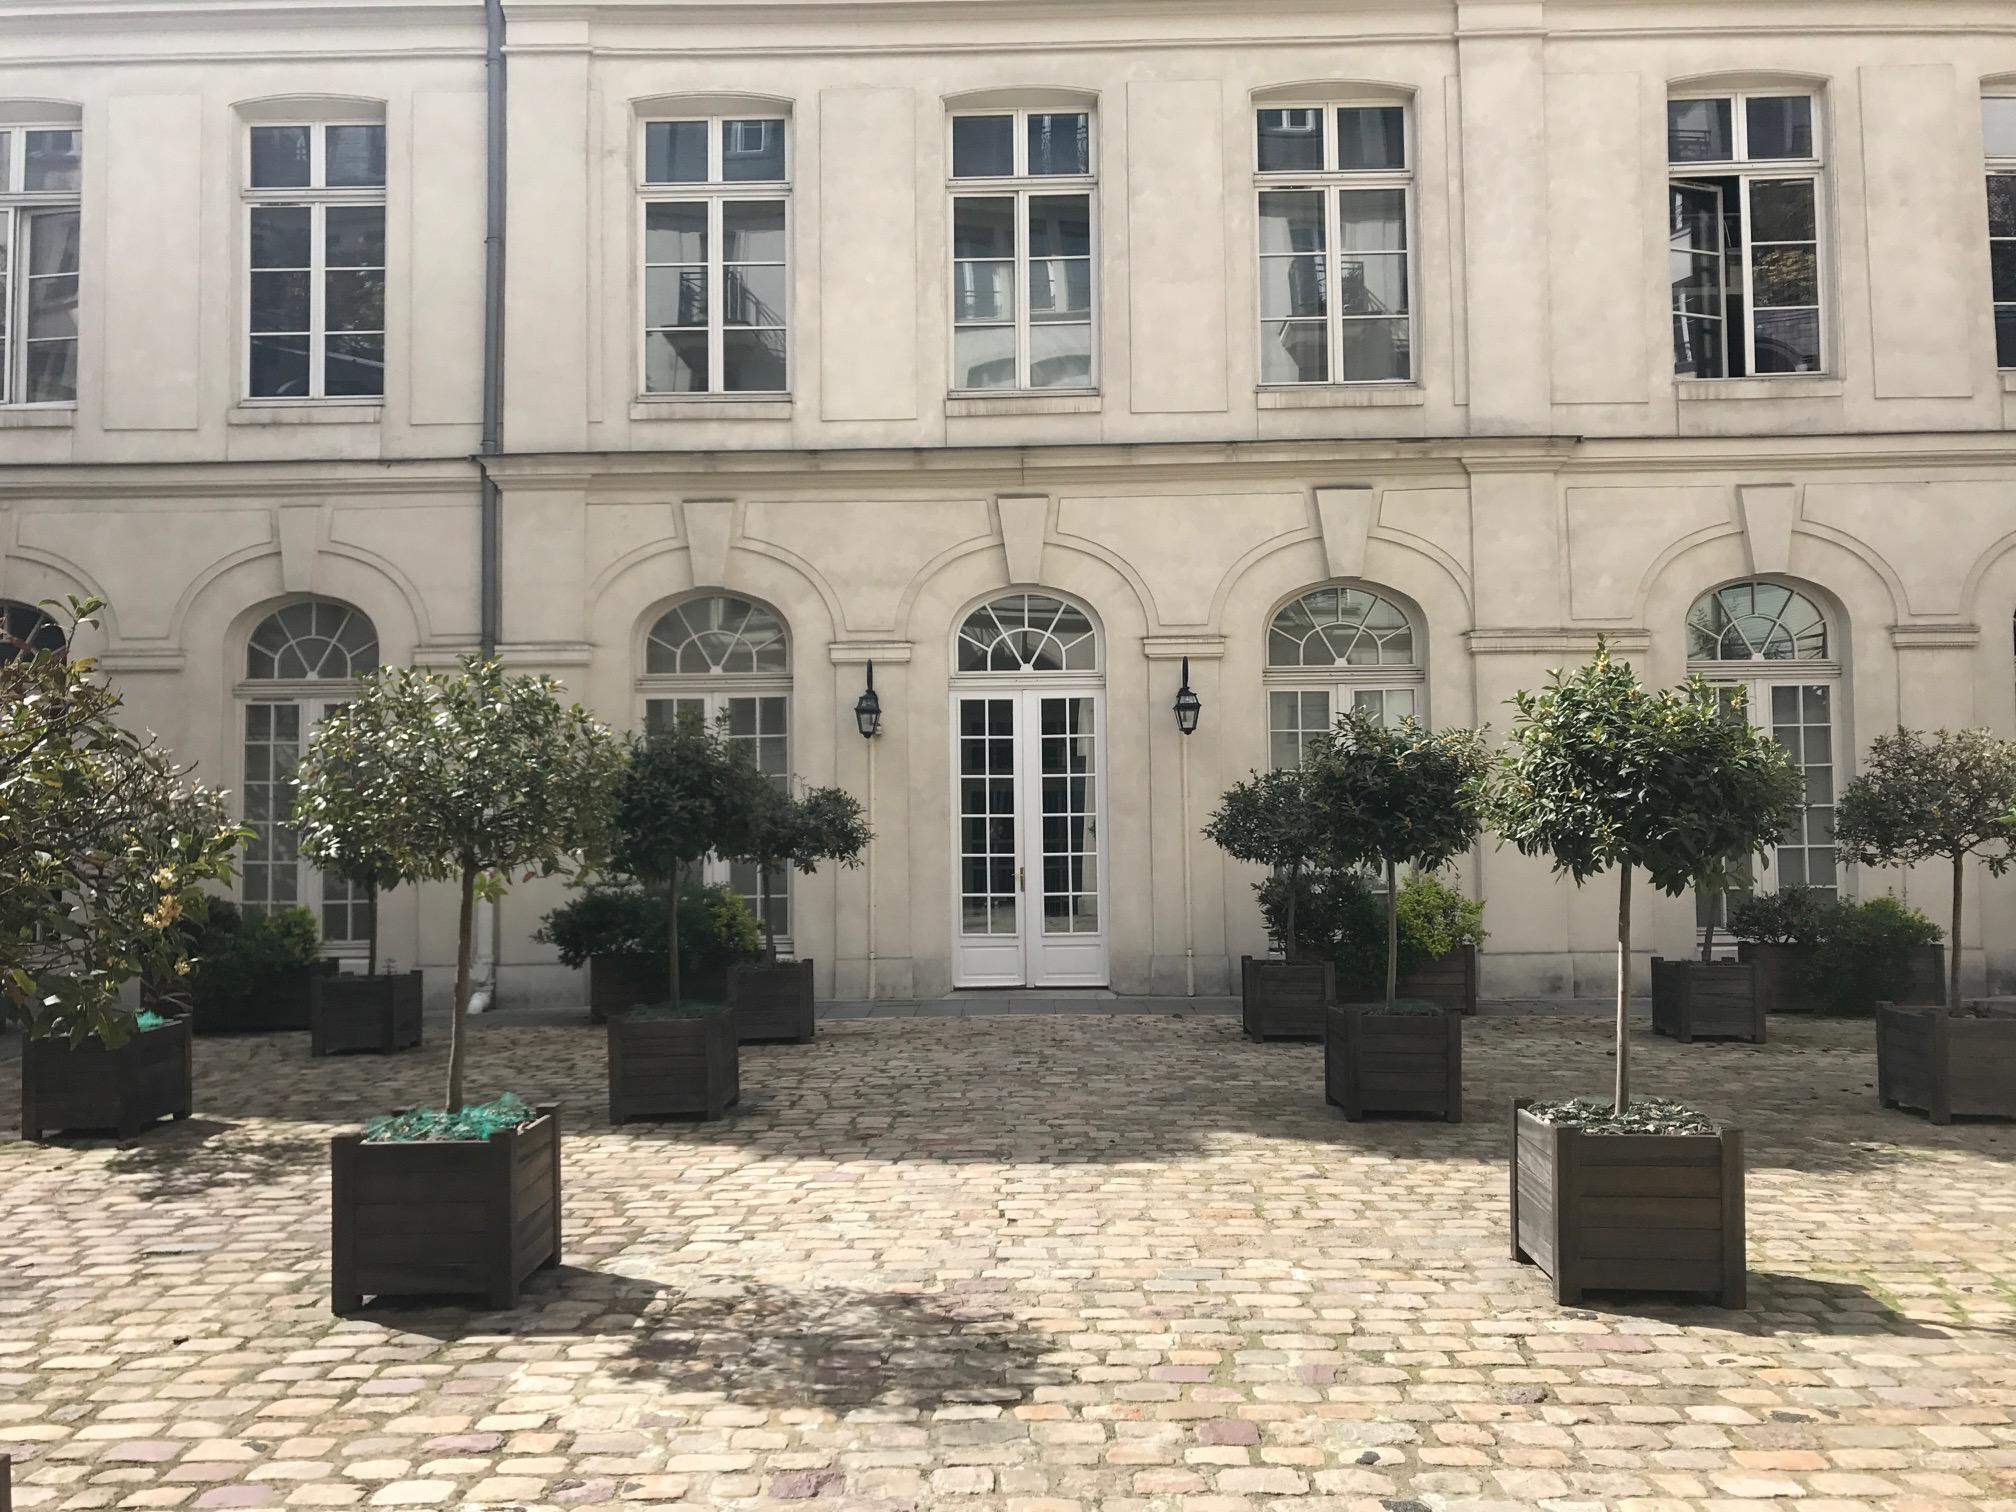 Appartement 4 pièces 98 m² MONNAIE-PONT NEUF-ODEON